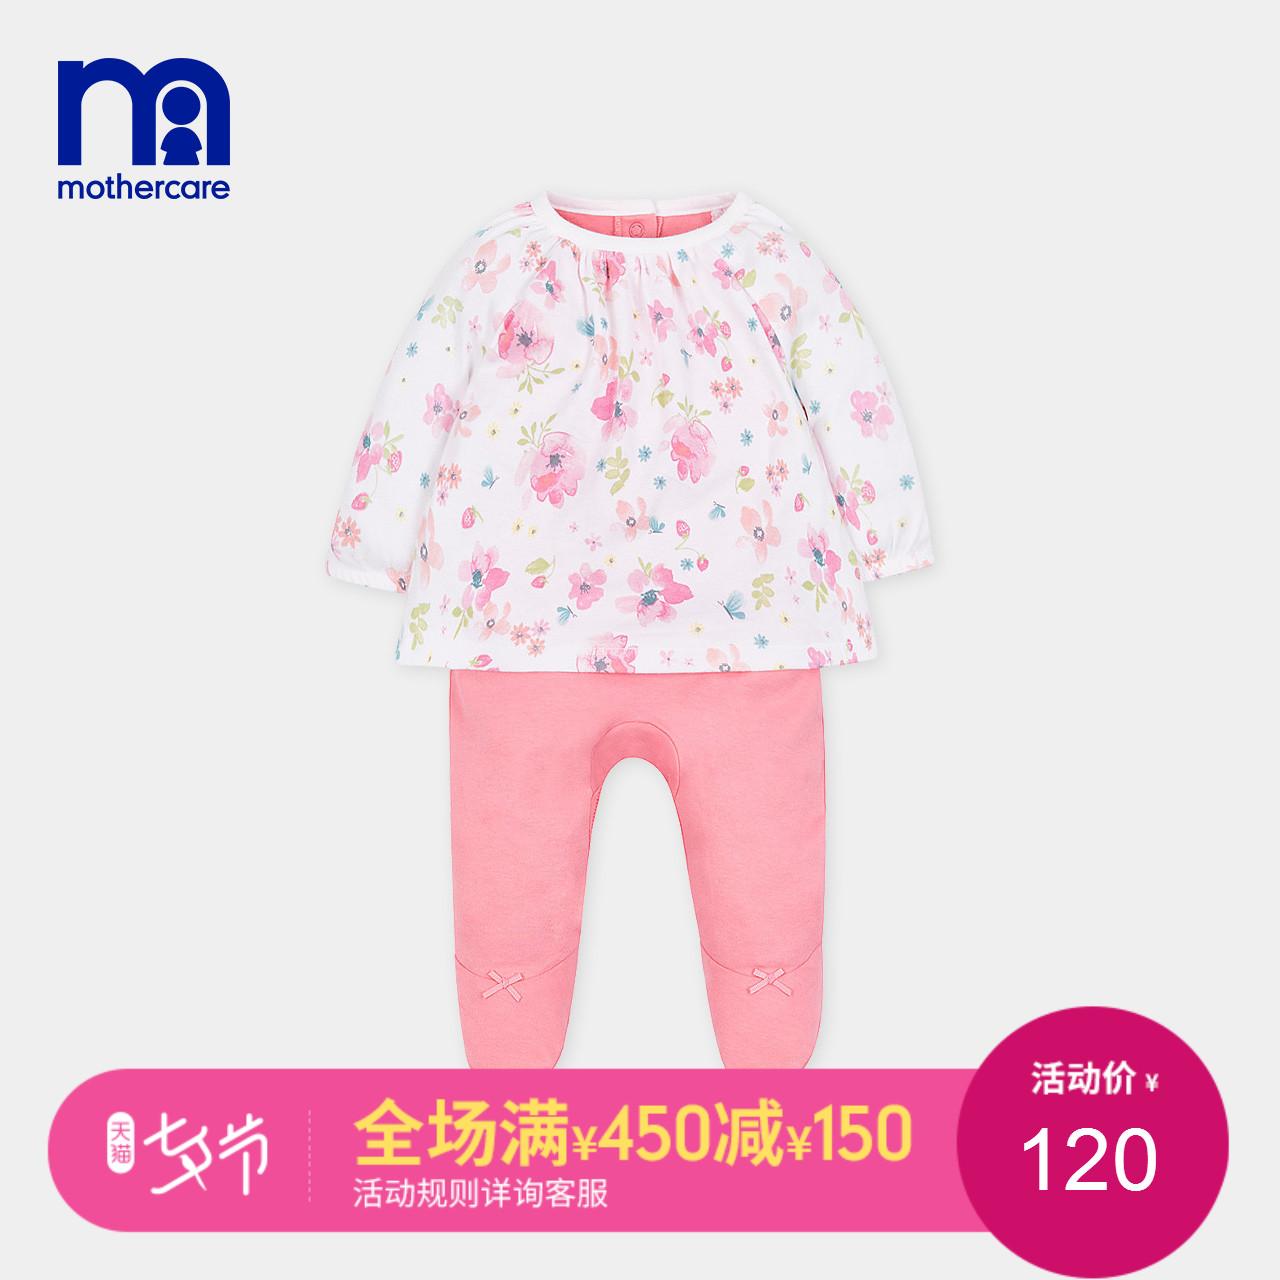 mothercare婴儿春装女新款棉质花卉植物图案长袖女婴连体衣哈衣